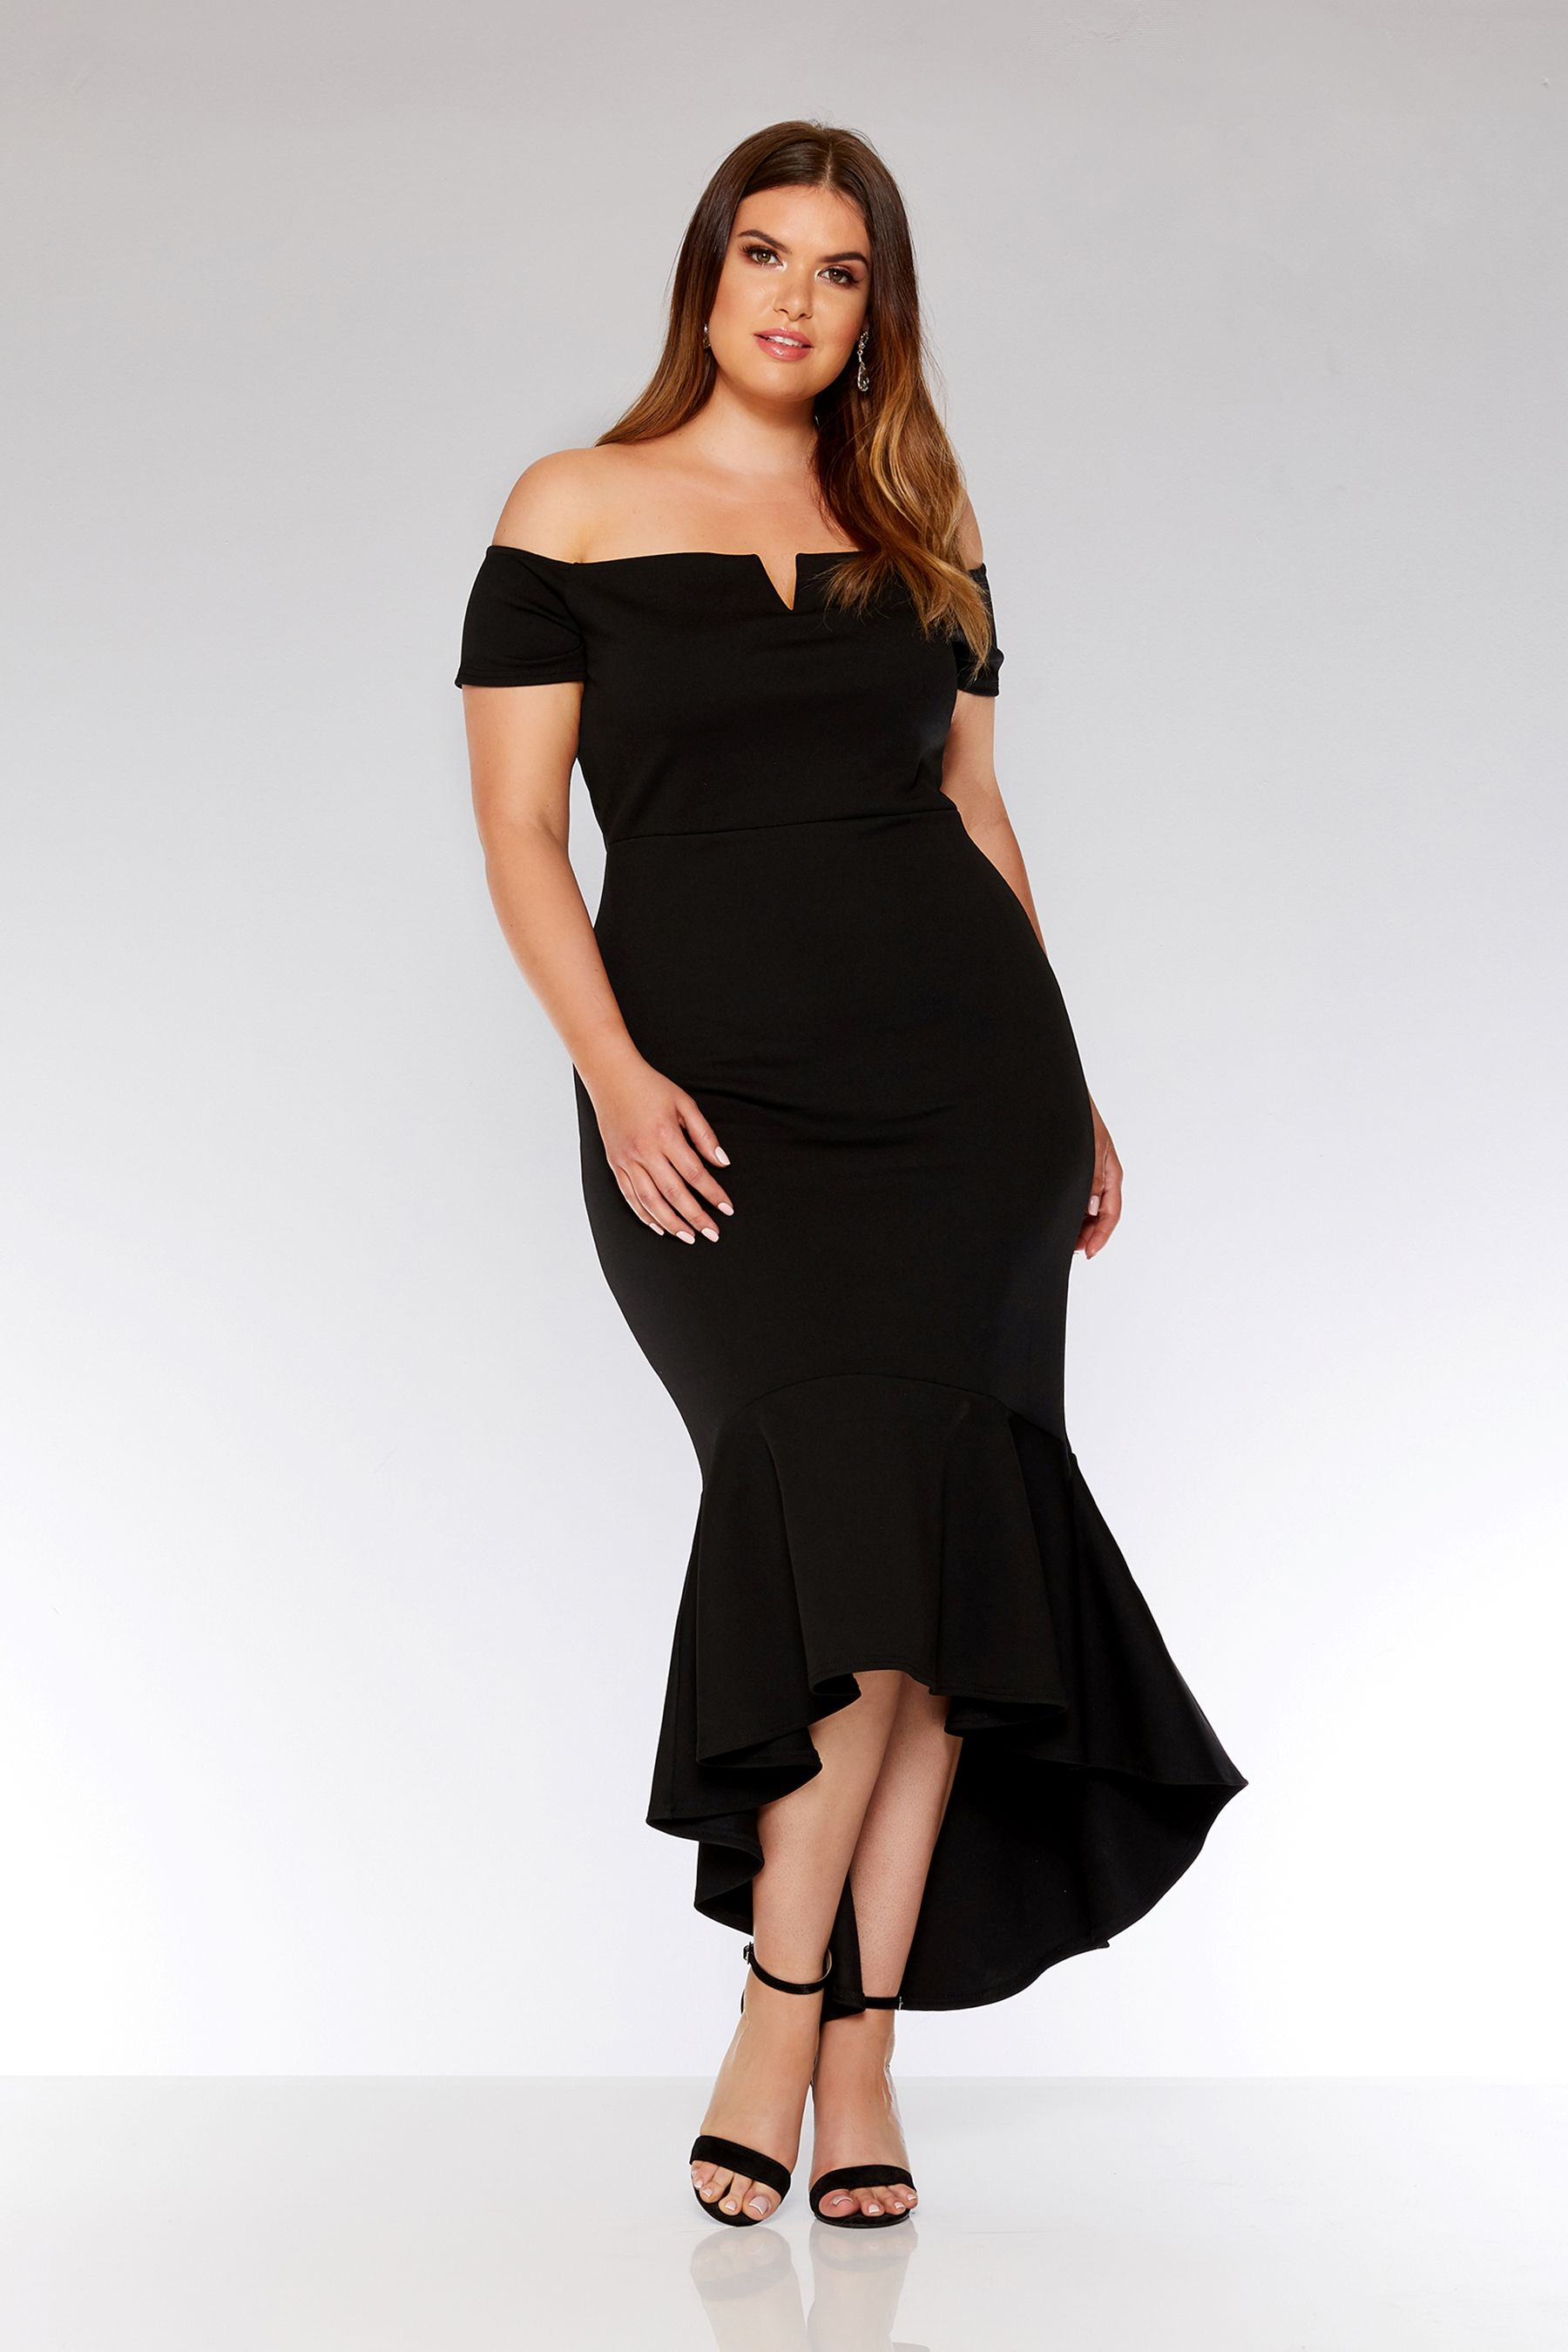 db493ba89a8 Womens Quiz Curve Bardot V Bar Fishtail Maxi Dress - Black ...